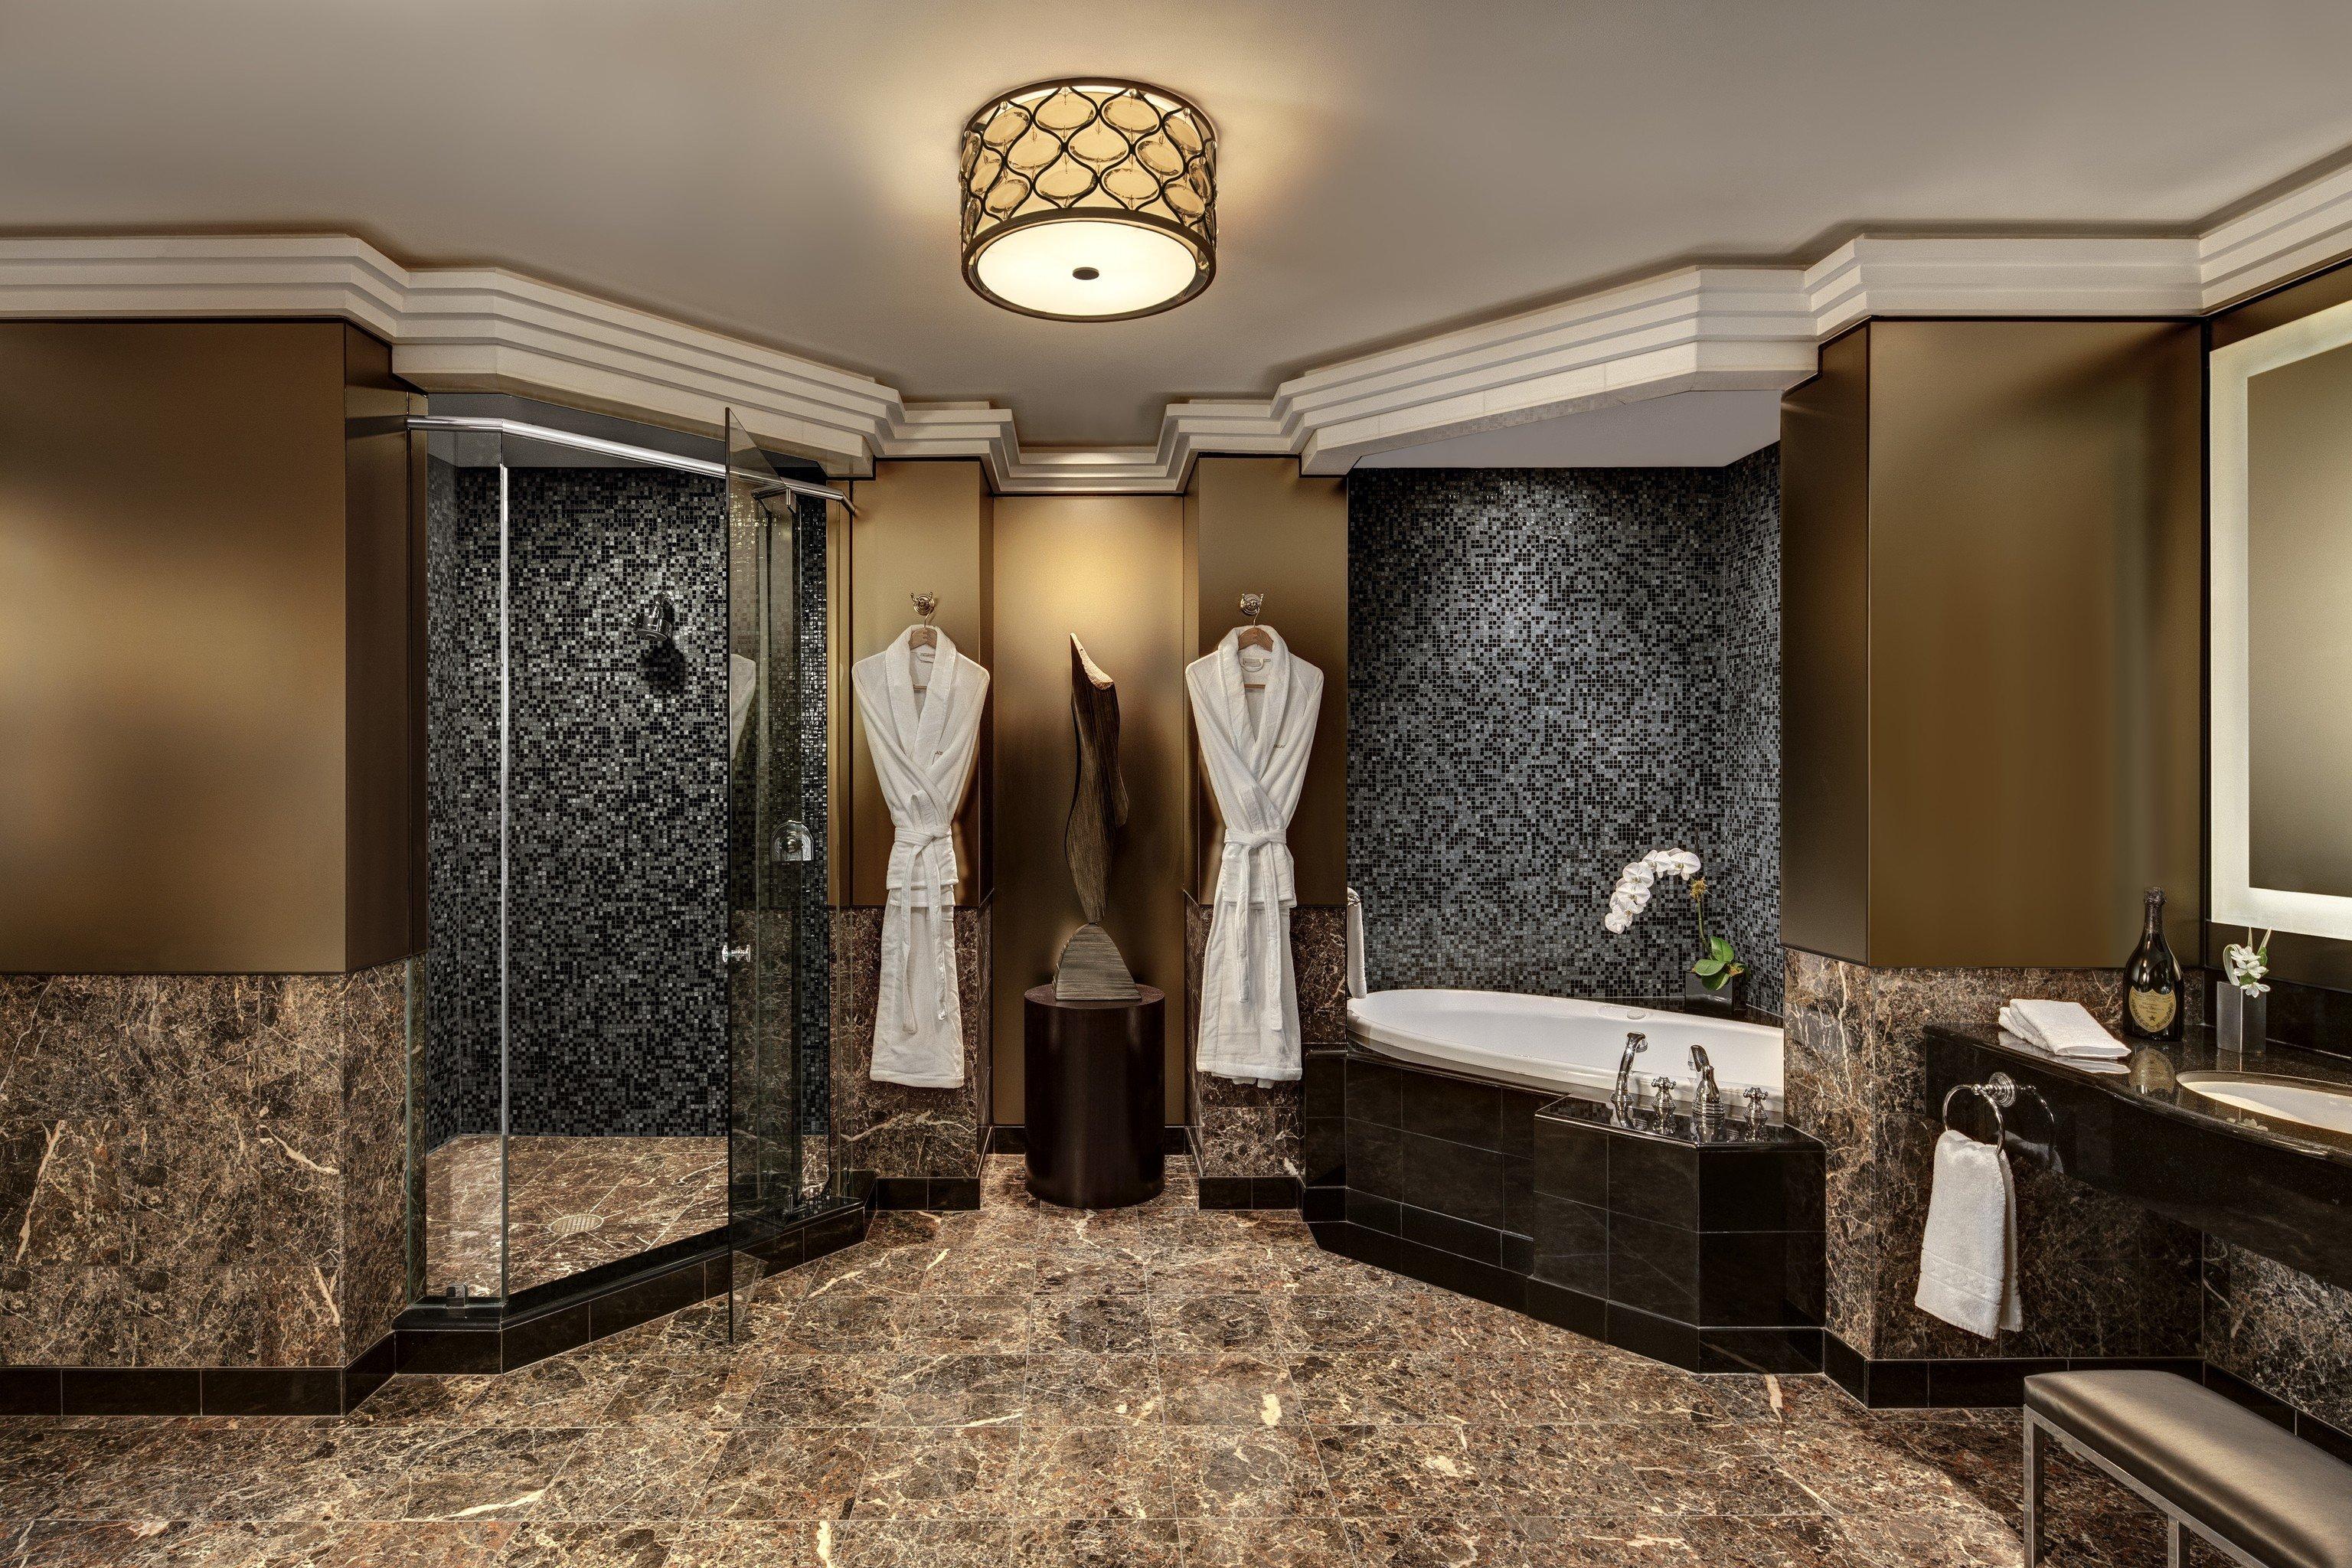 Hotels Luxury Travel indoor wall room interior design ceiling Lobby flooring floor